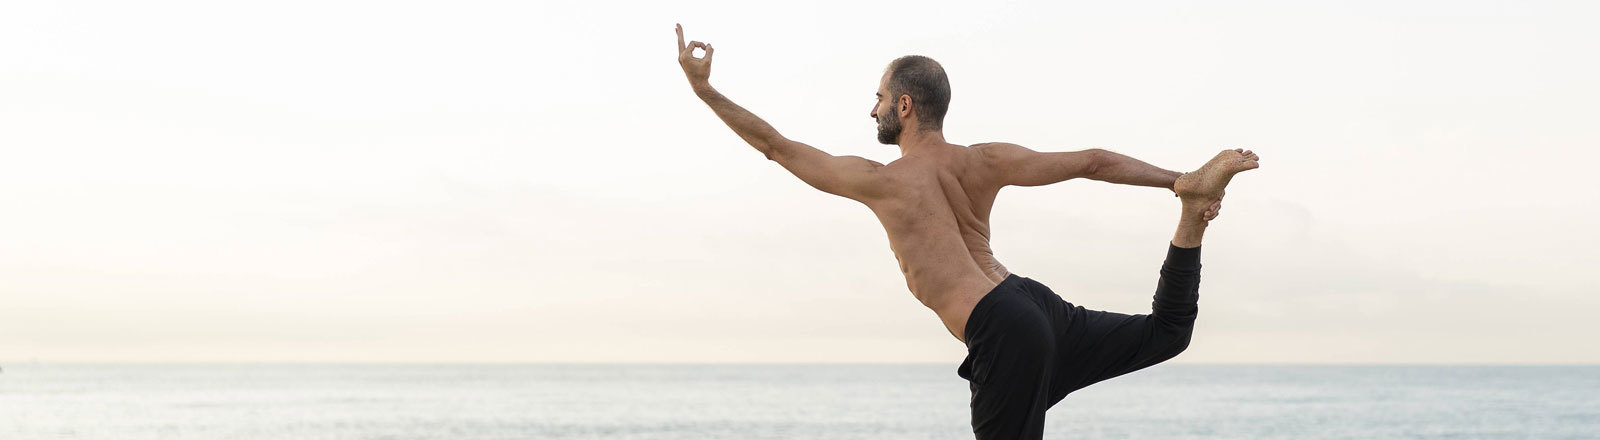 Mann macht Yoga am Strand